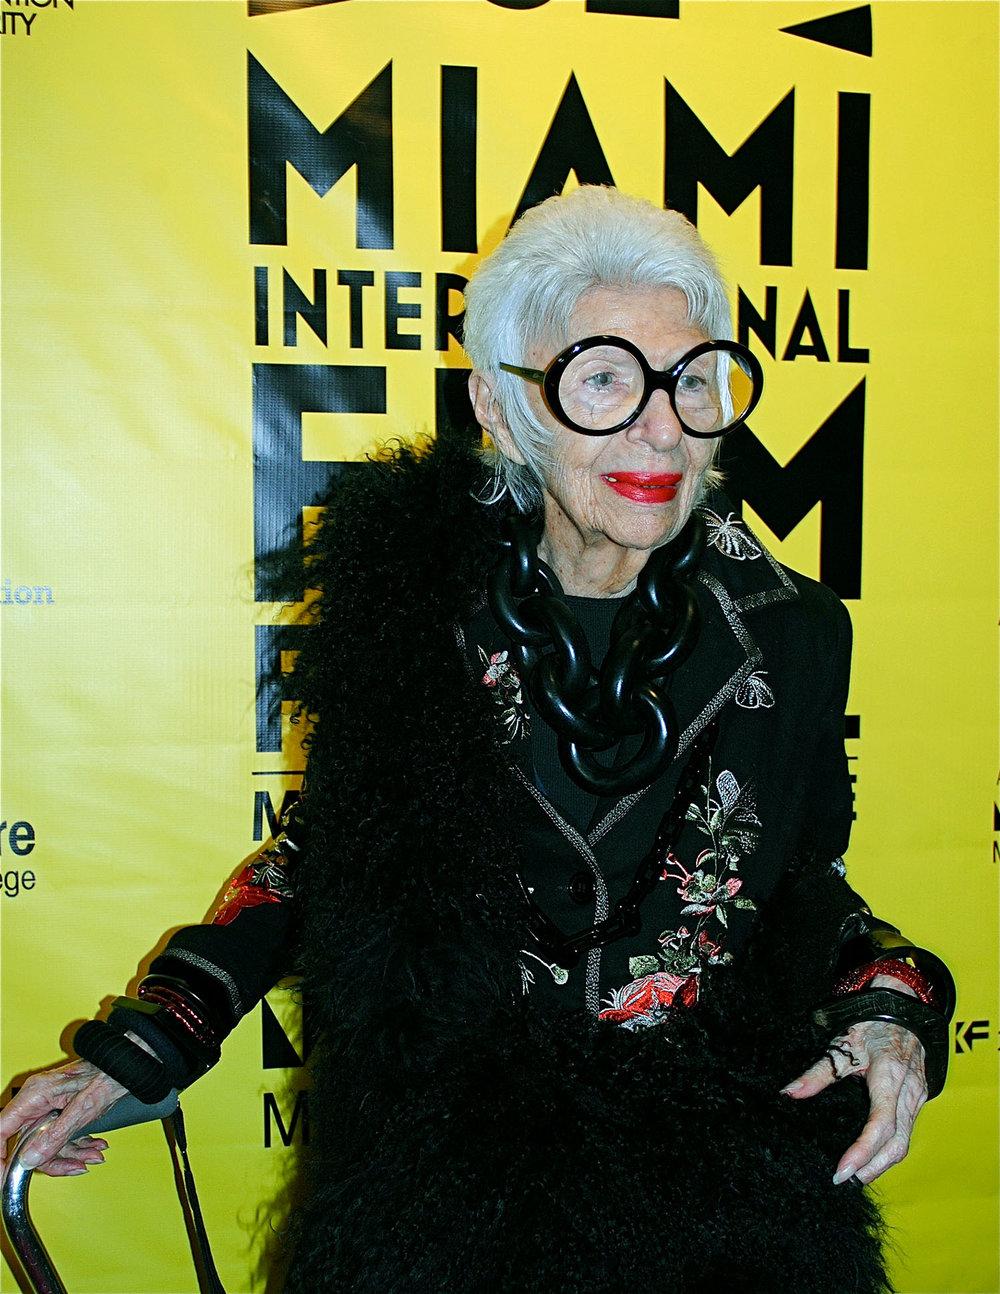 Image via Miami Film Festival